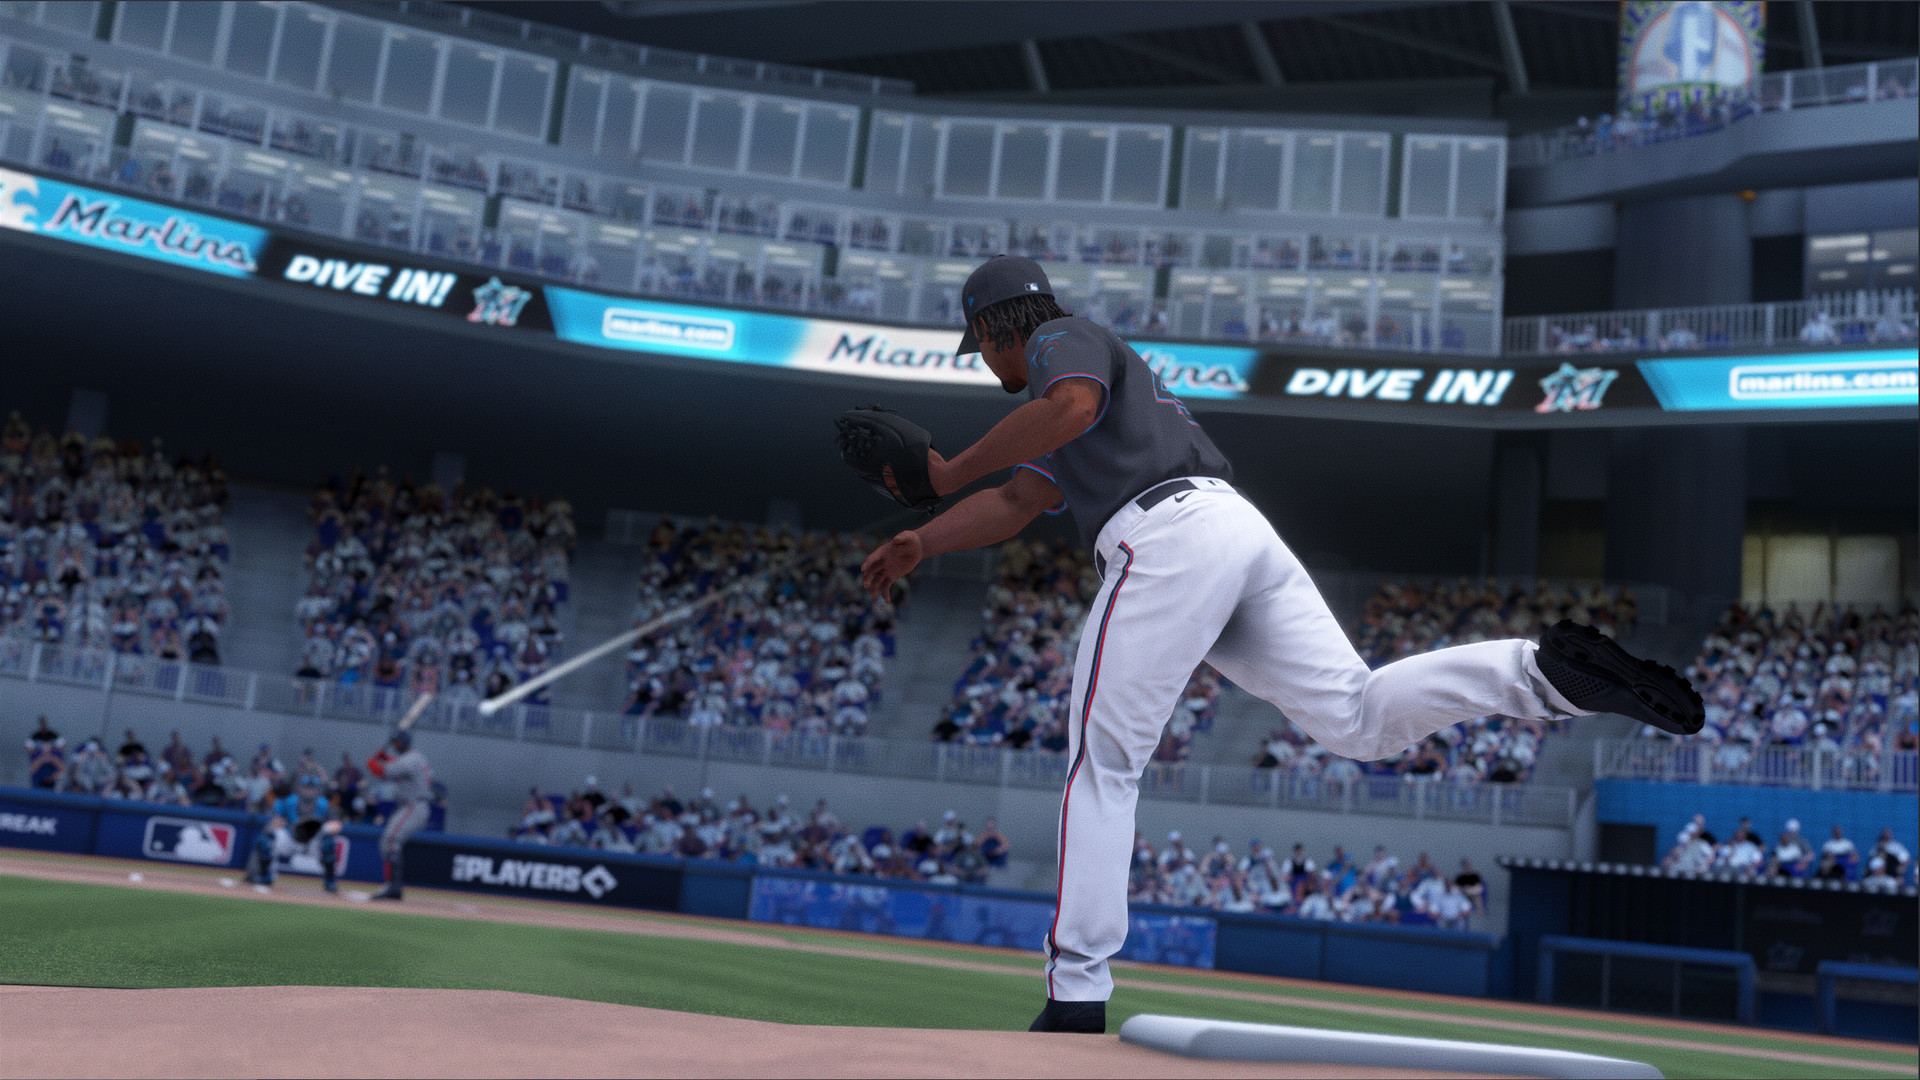 rbi-baseball-21-pc-screenshot-2